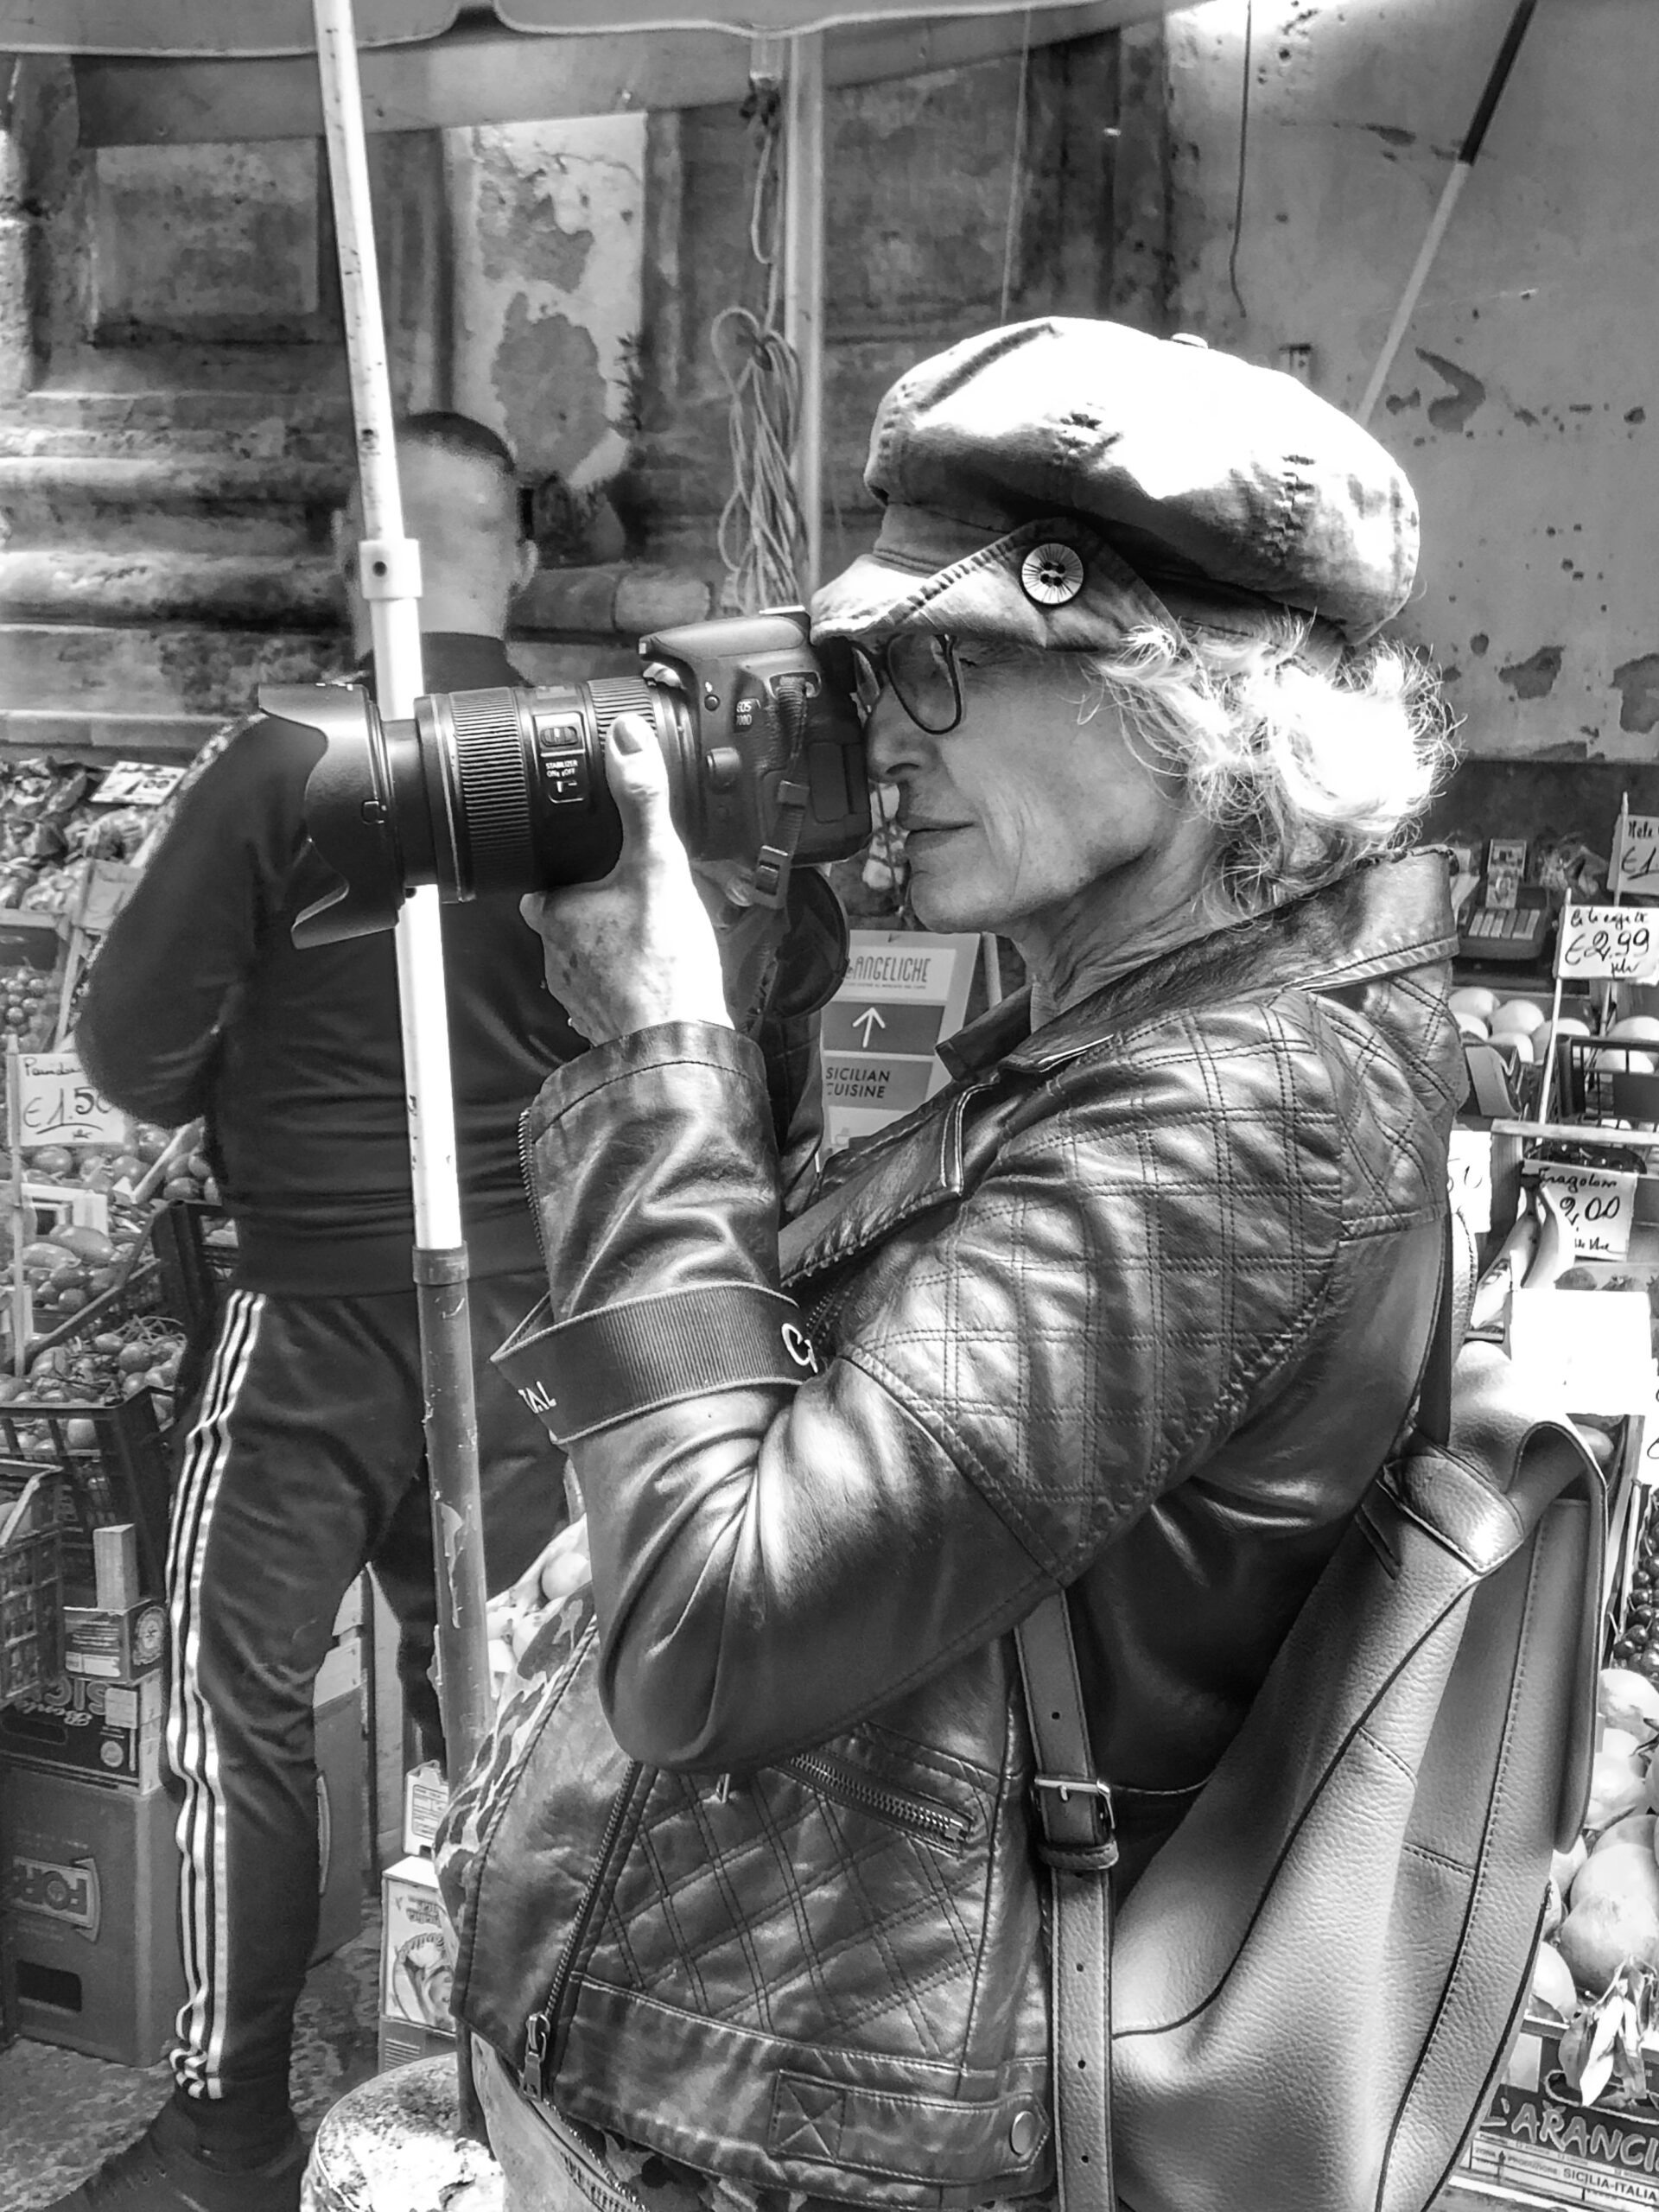 Travel Photography | THE PHOTOKITCHEN